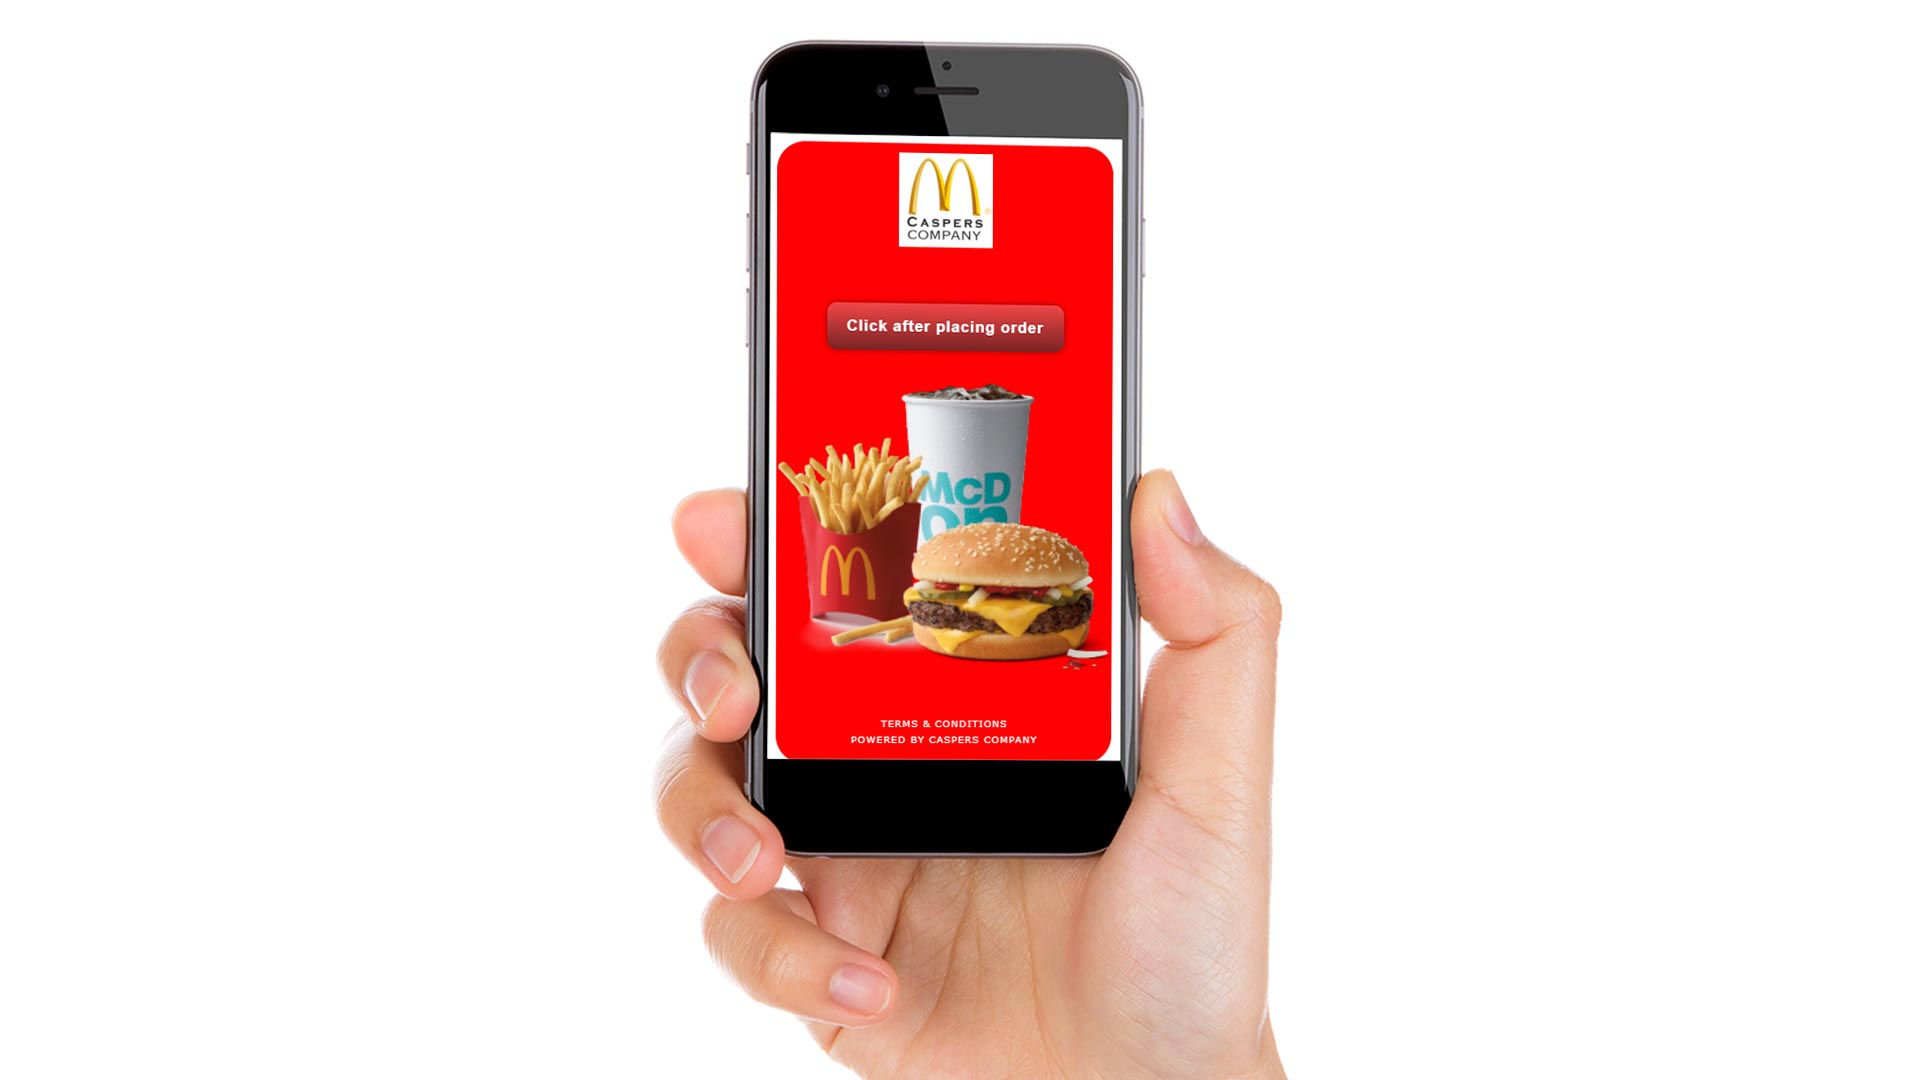 mcdonald's customer care use case image